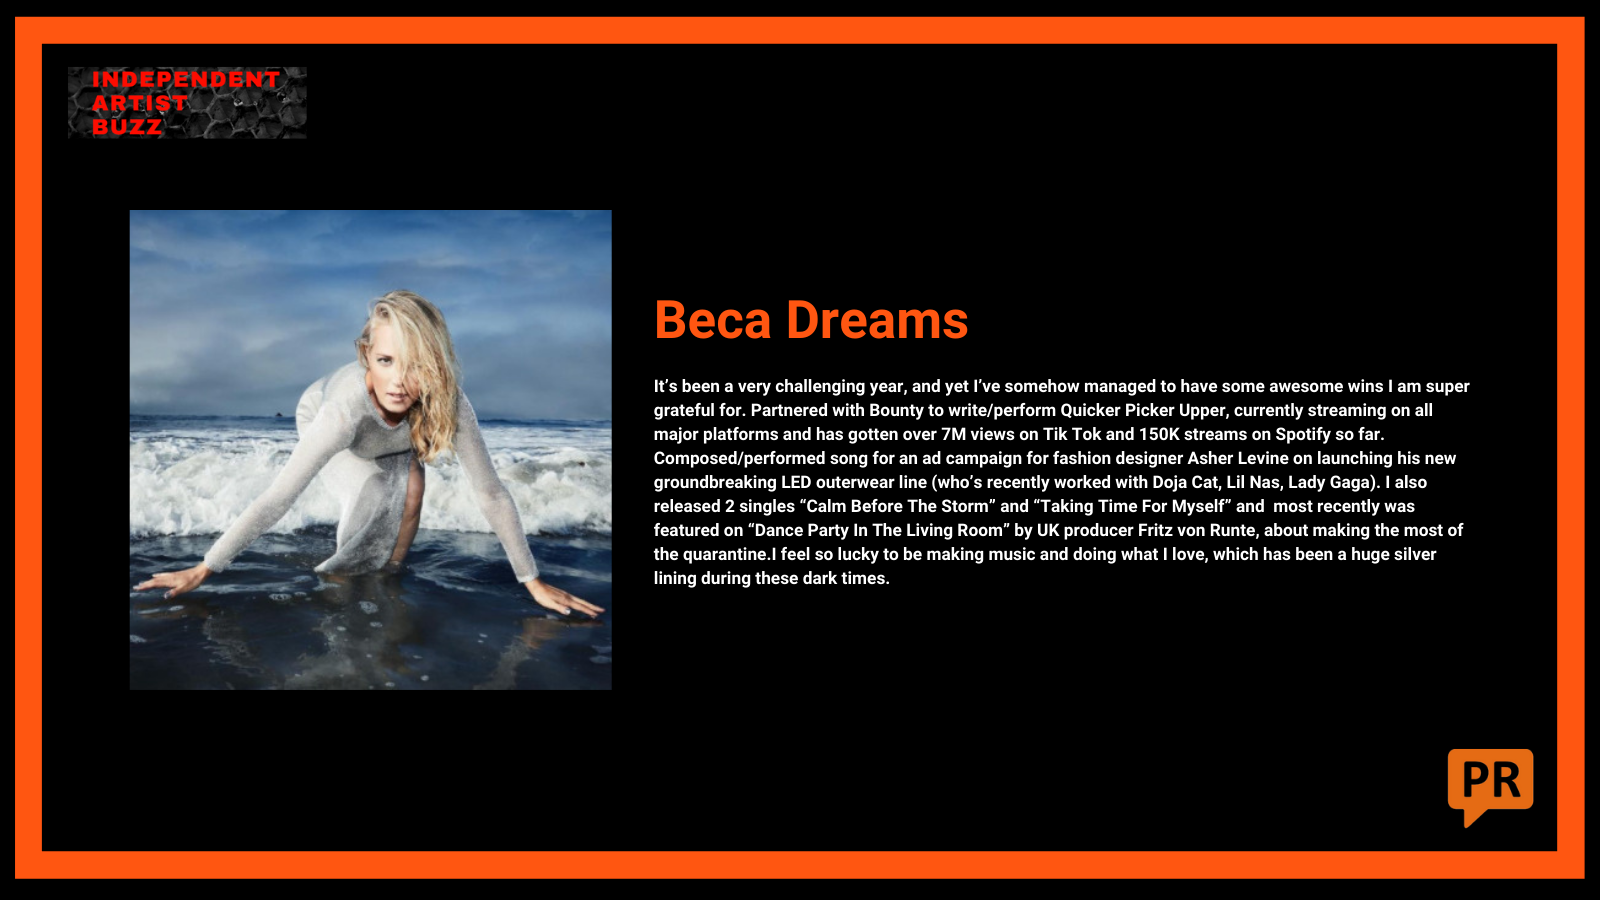 Beca Dreams